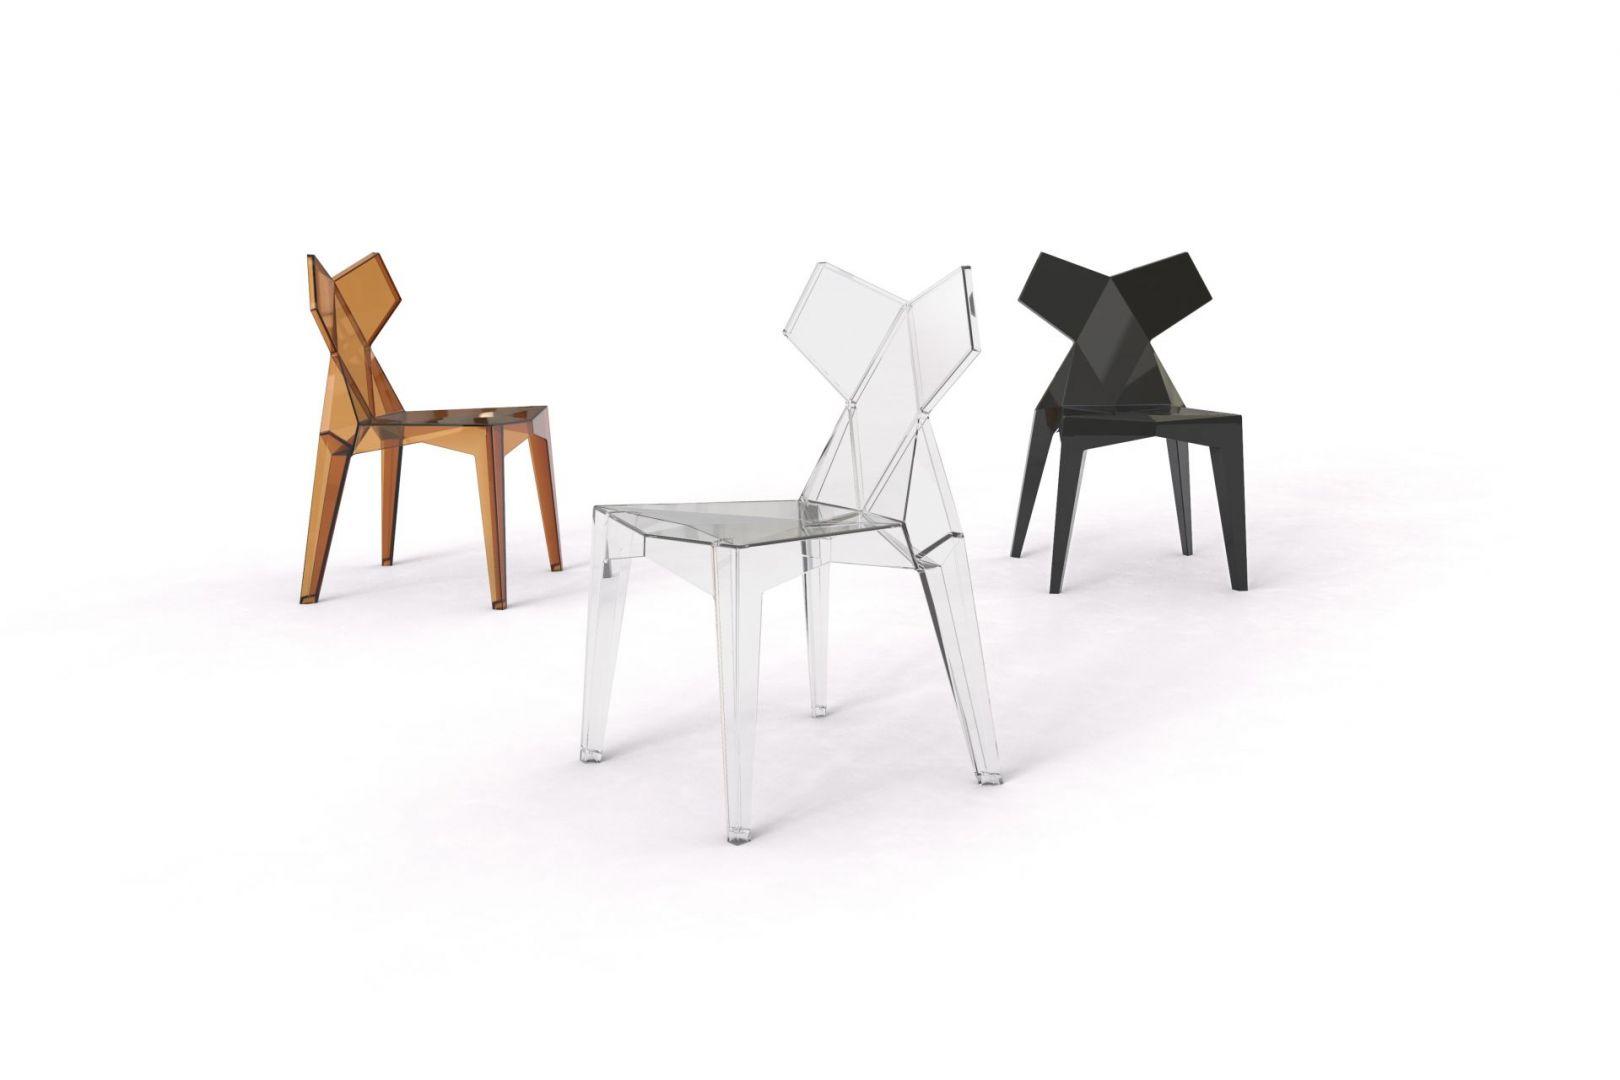 Krzesło Kimono, projekt Ramon Esteve dla marki Vondom. Fot. Vondom